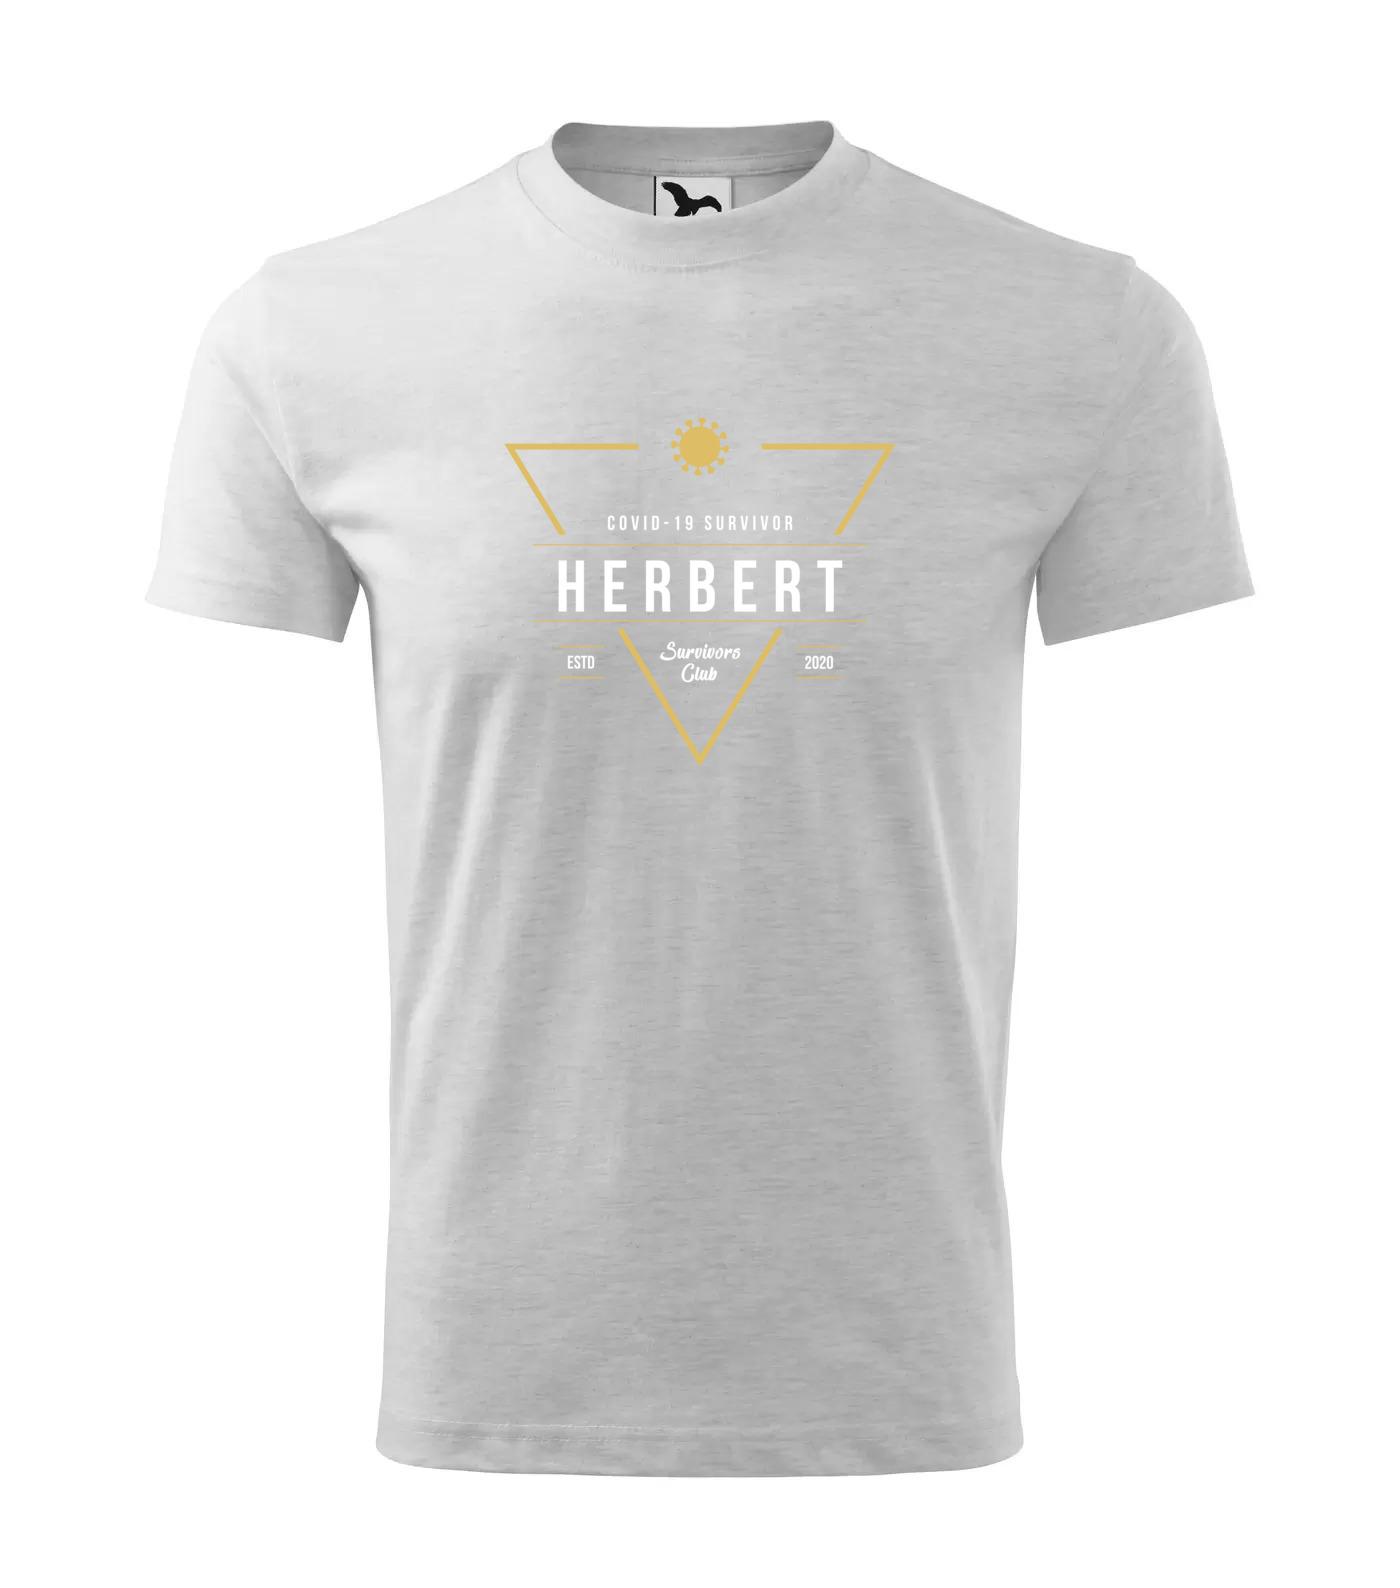 Tričko Survivor Club Herbert